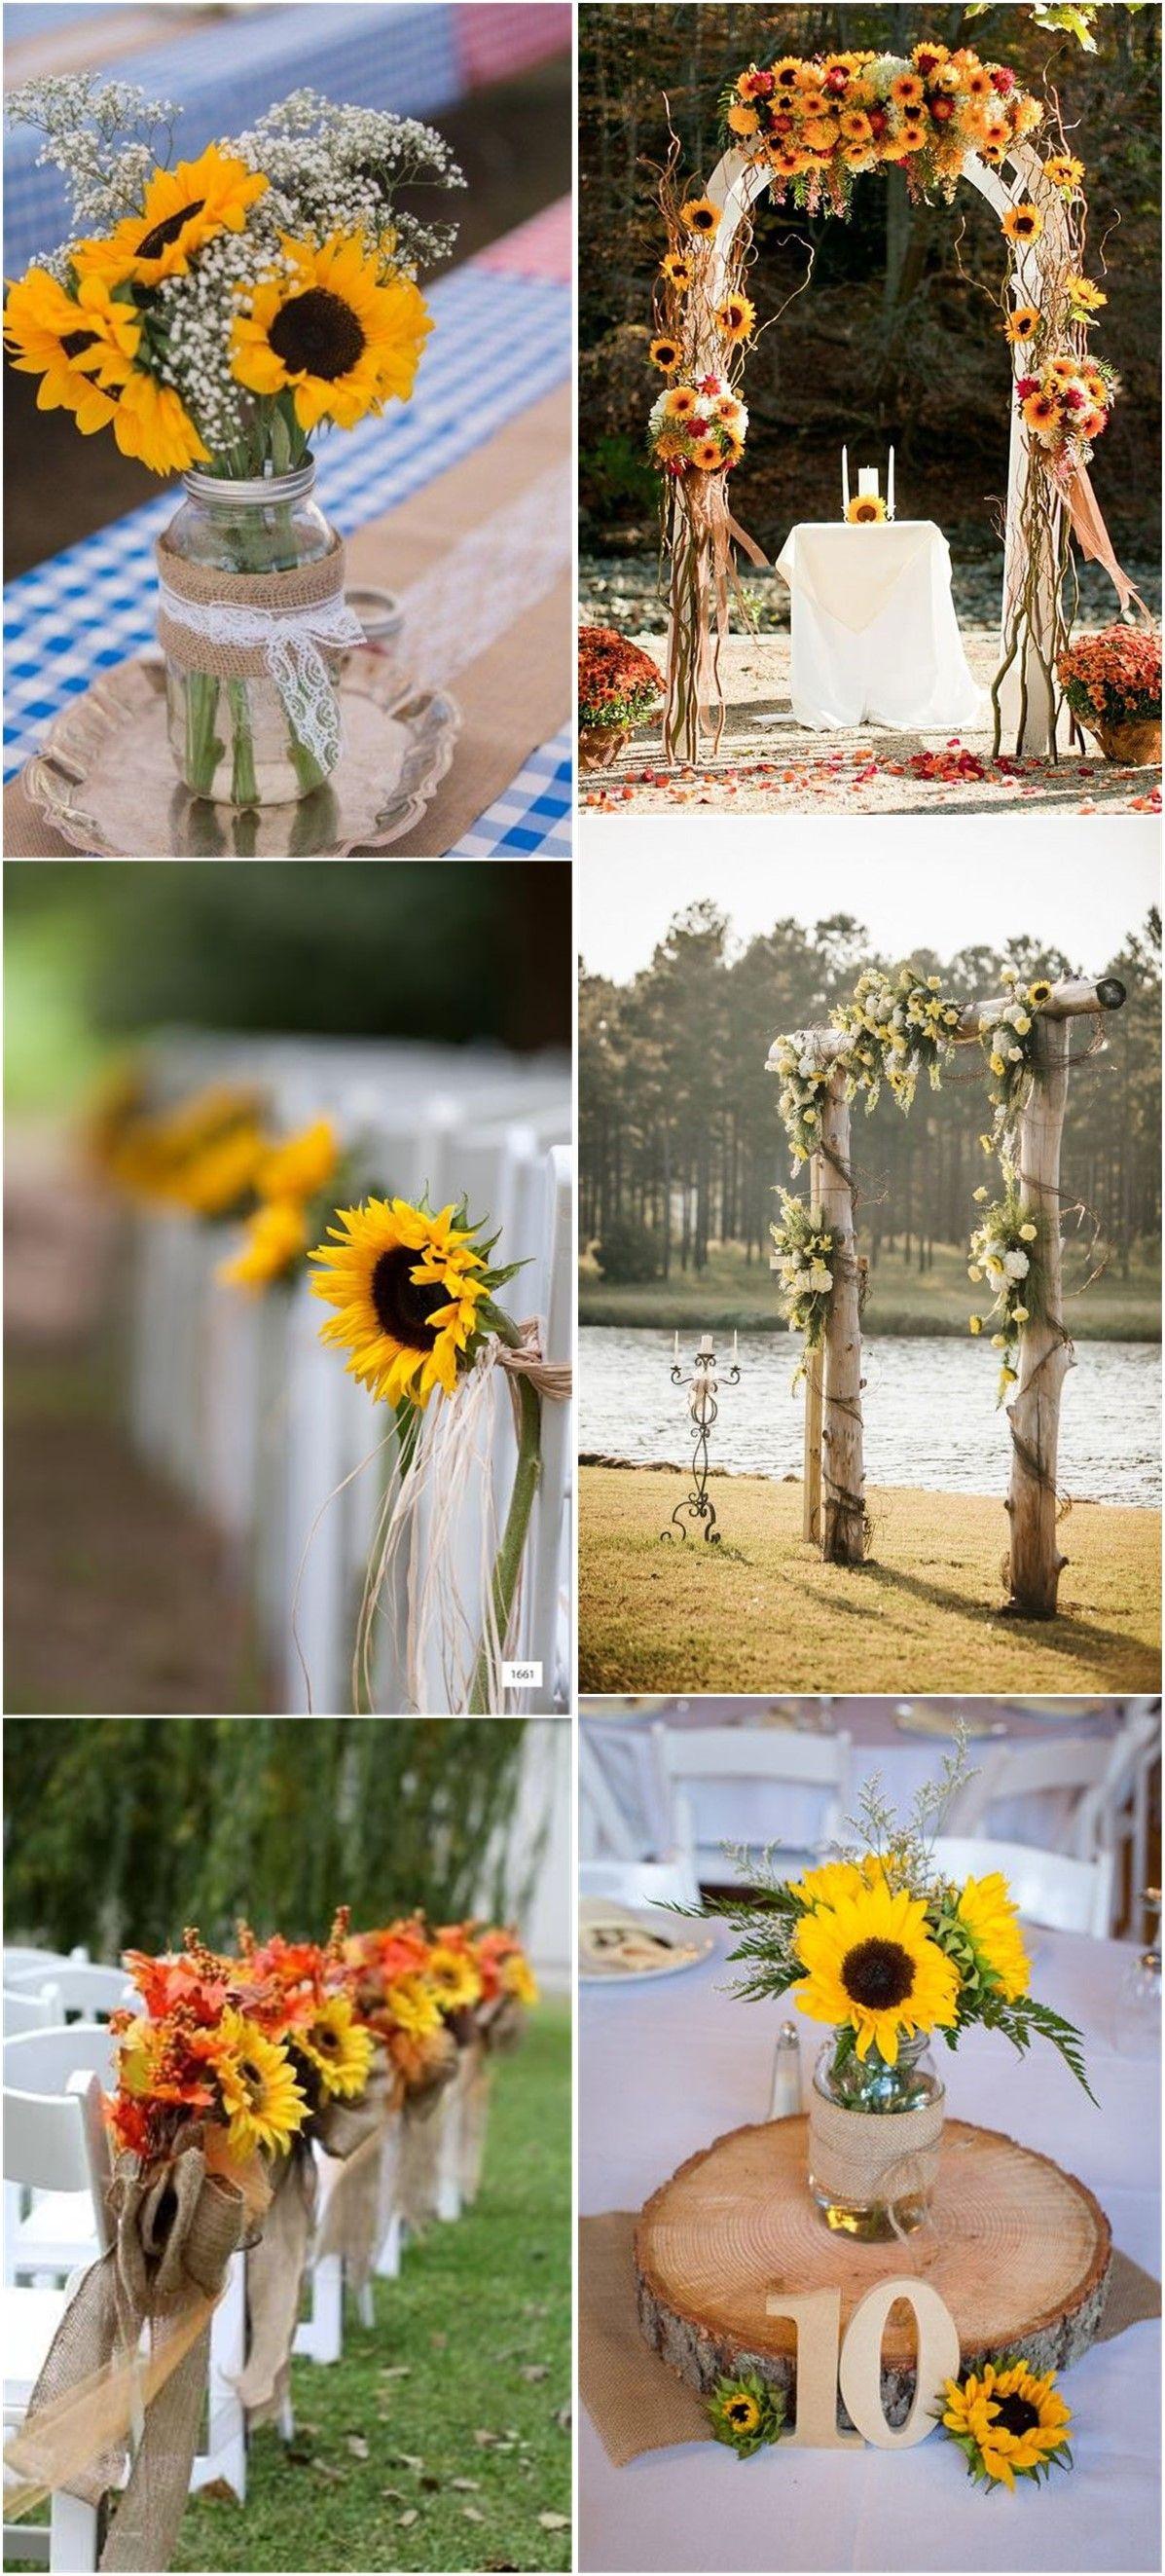 Rustic weddings 23 bright sunflower wedding decoration ideas for rustic weddings 23 bright sunflower wedding decoration ideas for your rustic wedding junglespirit Gallery